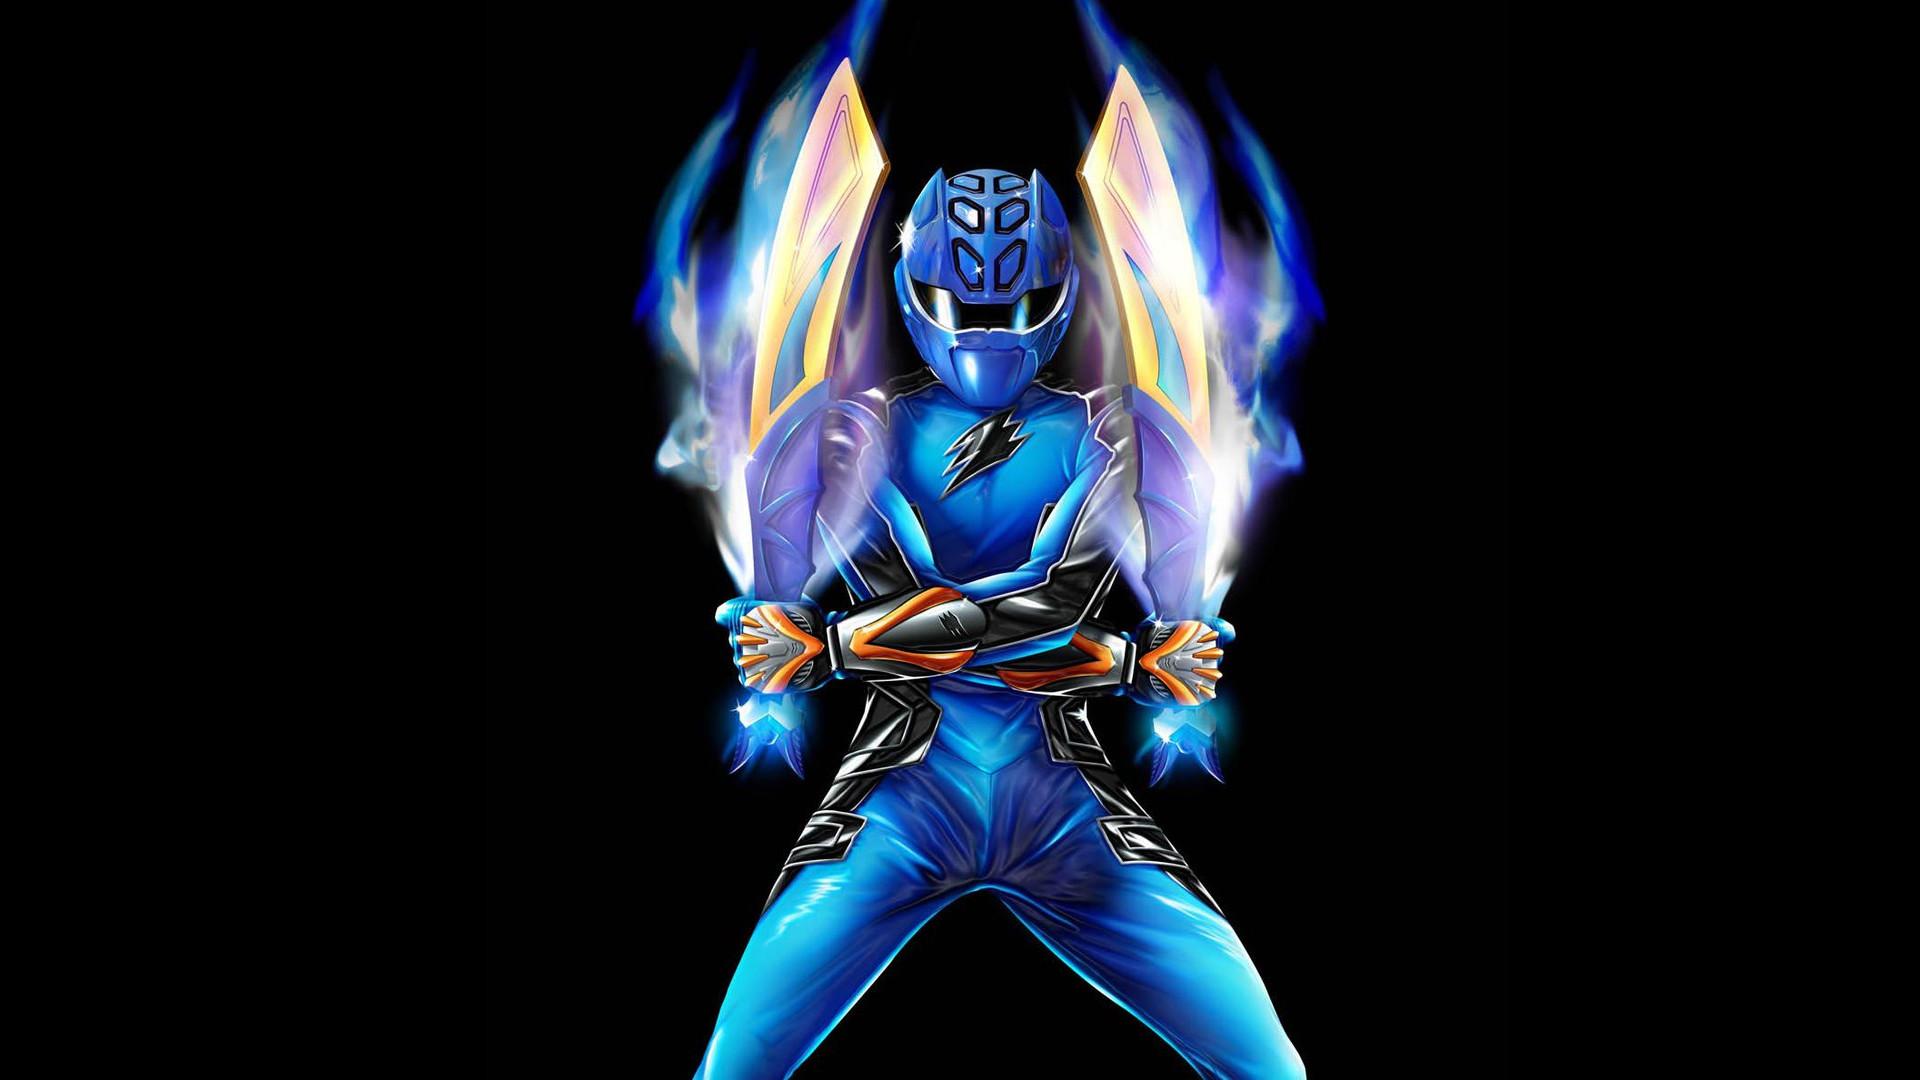 Power Rangers Wallpapers – Album on Imgur